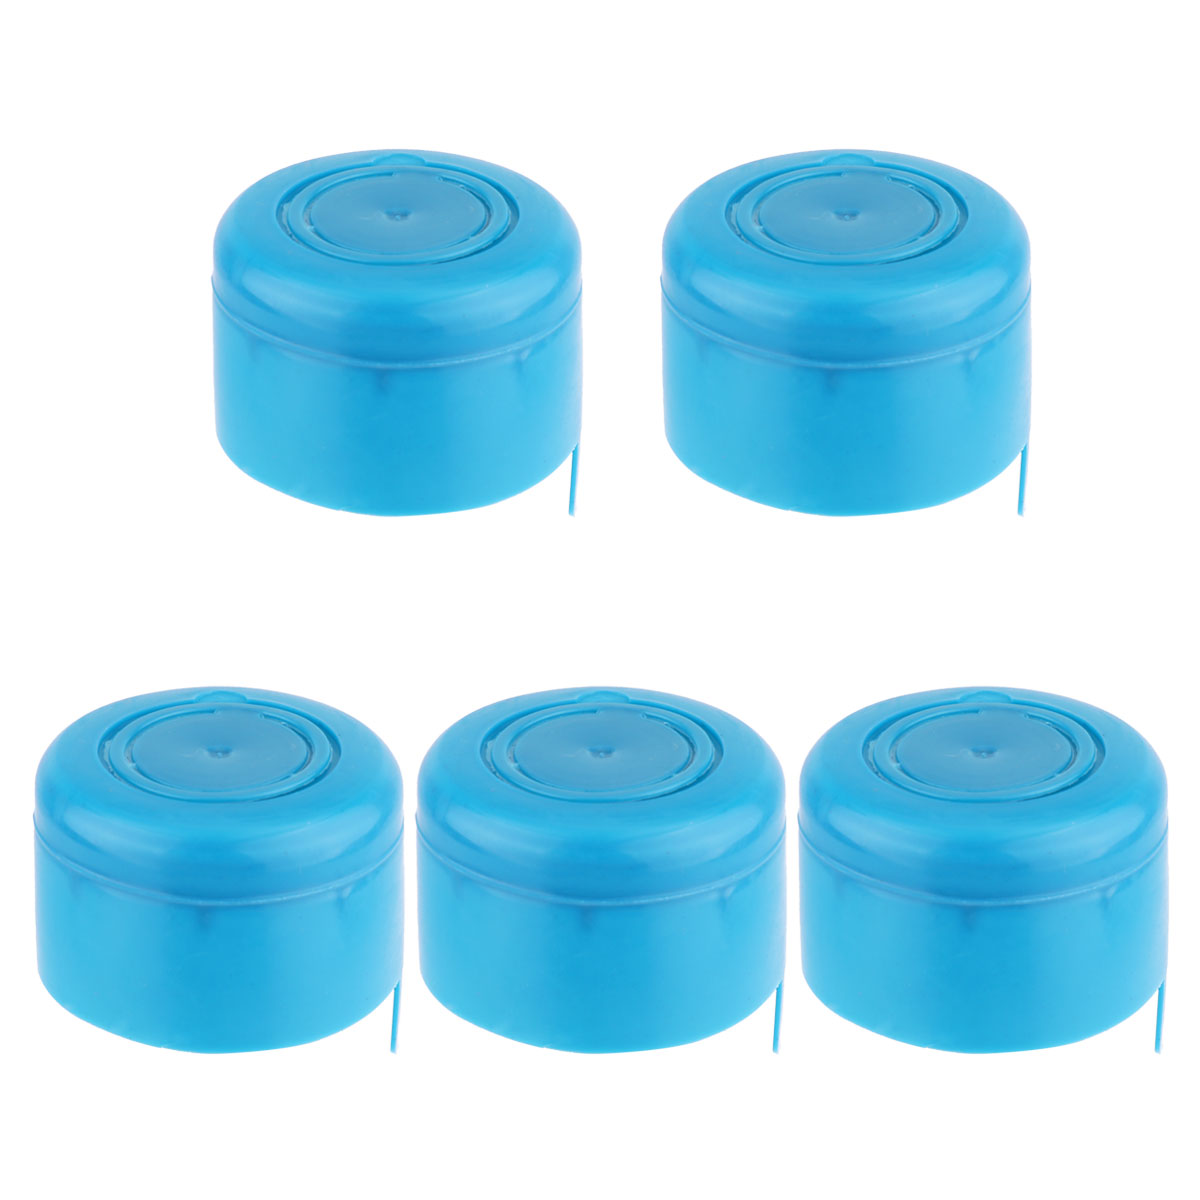 5Pcs Reusable Anti-Splash Non-Spill Water Bottle Caps Replacement 55mm 3 Gallon Water Jugs 5 Gallon Water Bottle Cap